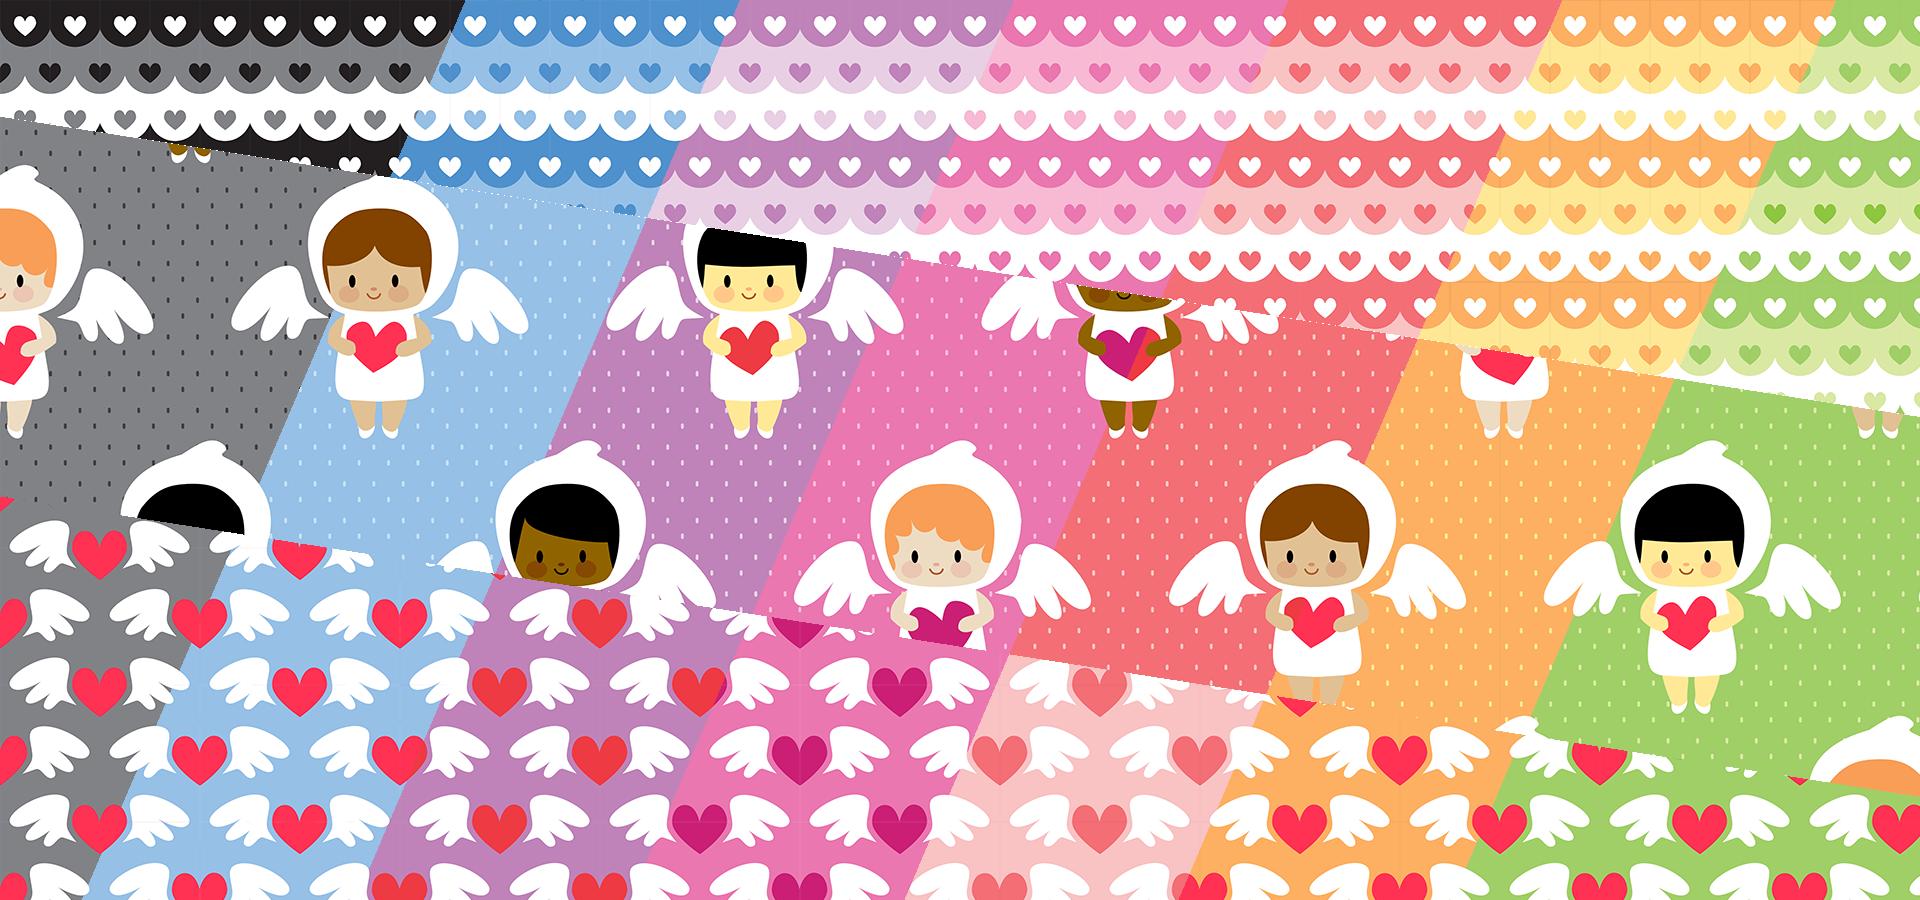 Collection motifs anges kawaii et petits coeurs